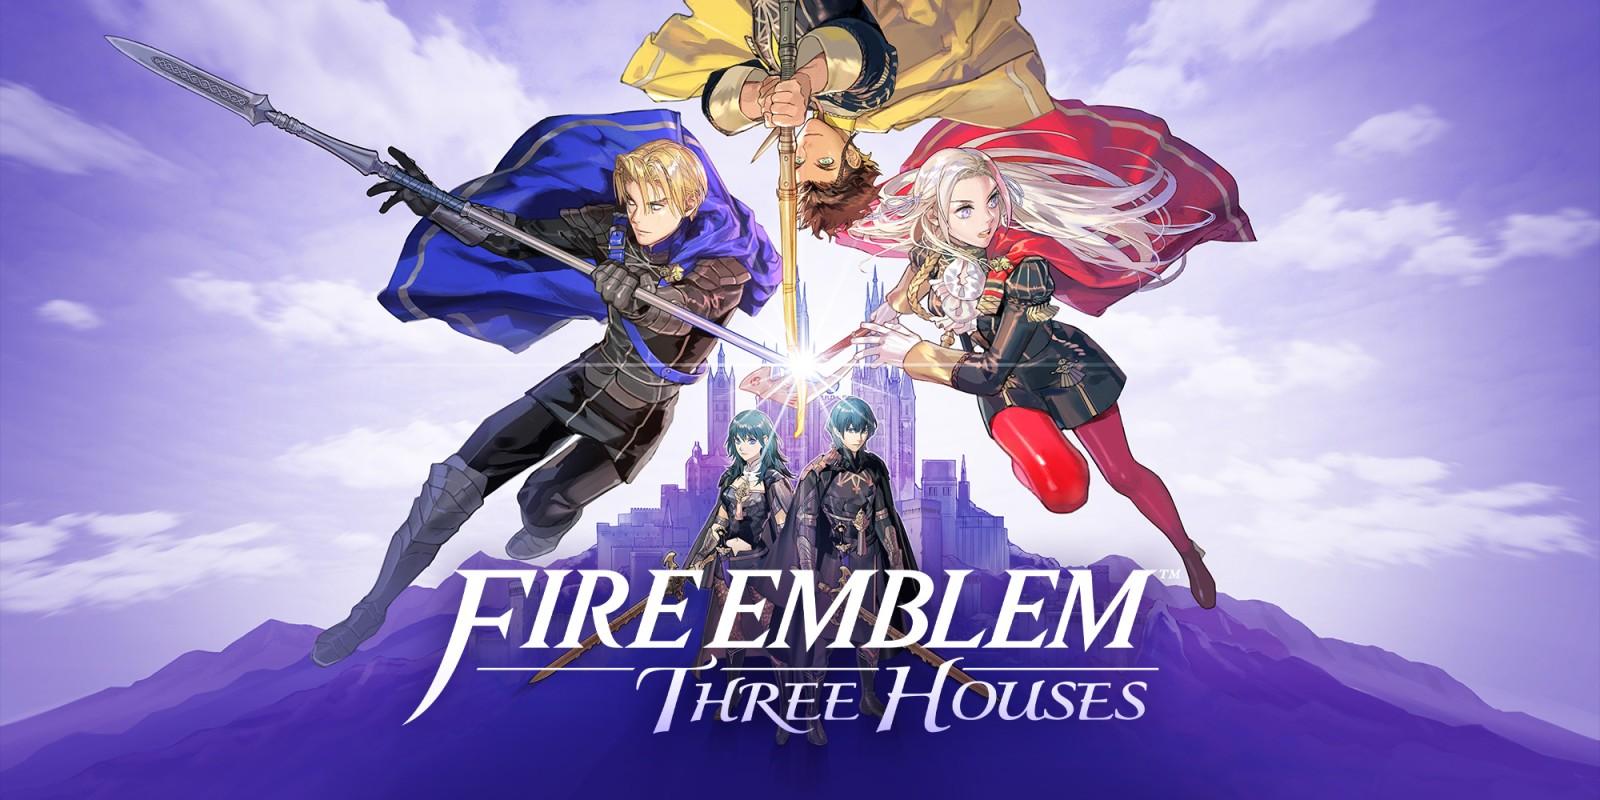 Fire Emblem: Three Houses, un ambicioso RPG para llevar